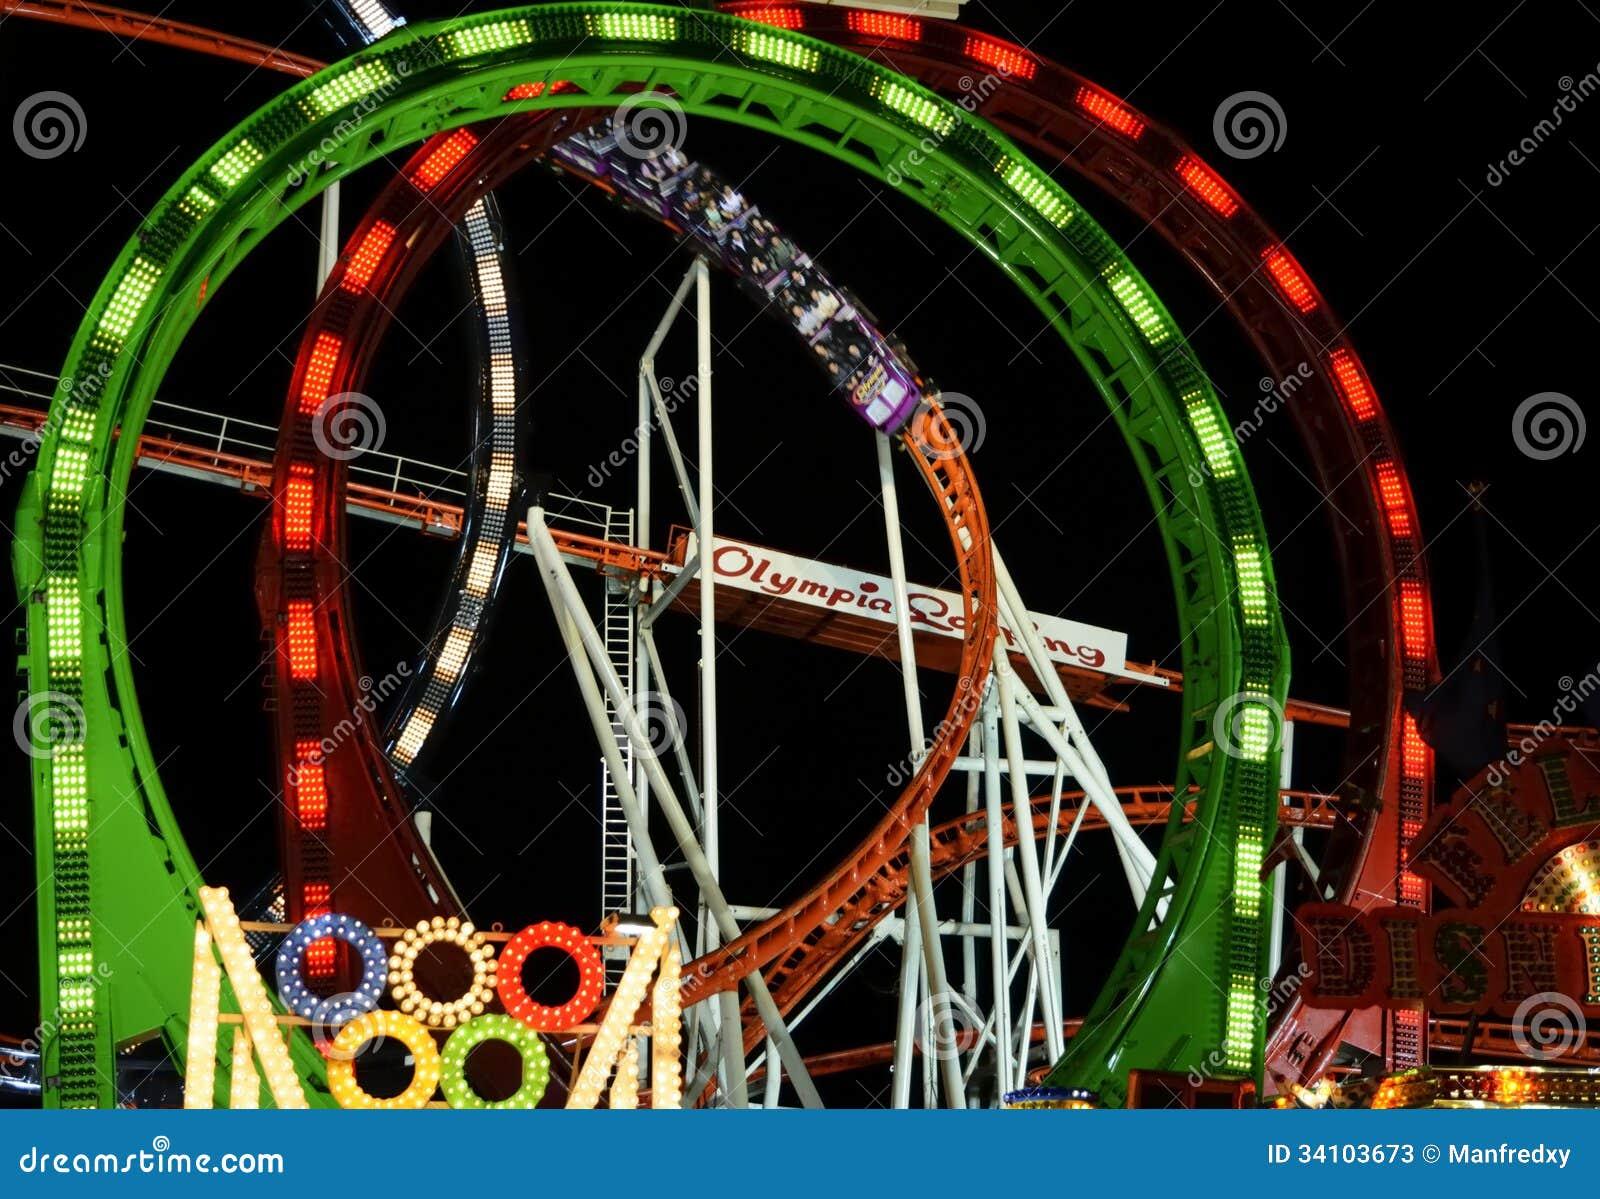 roller coaster at the oktoberfest editorial stock photo image 34103673. Black Bedroom Furniture Sets. Home Design Ideas